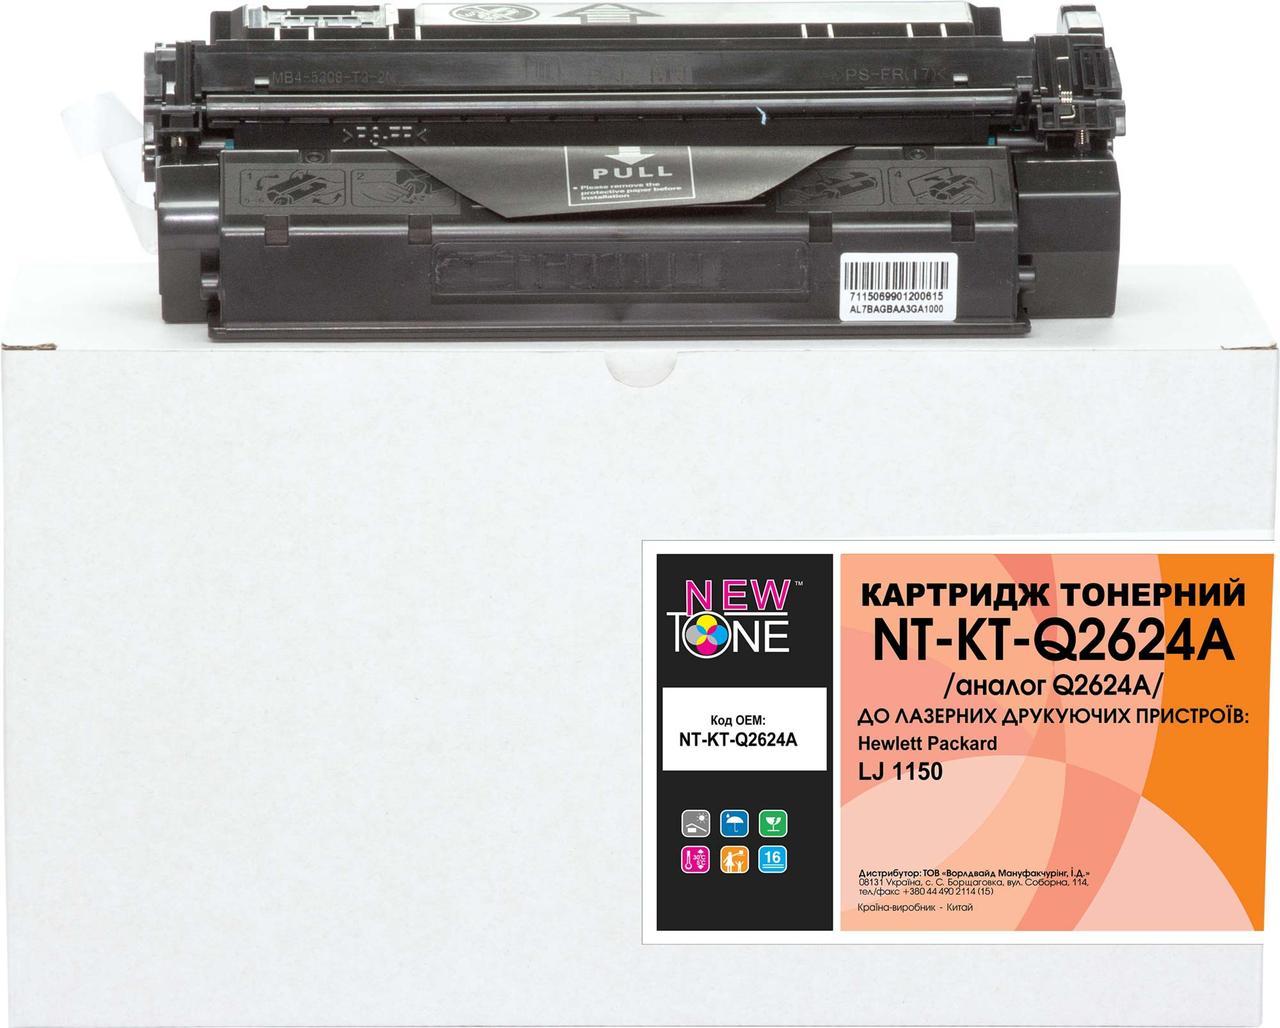 Картридж тонерный NewTone для HP LJ 1150 аналог Q2624A Black (NT-KT-Q2624A)